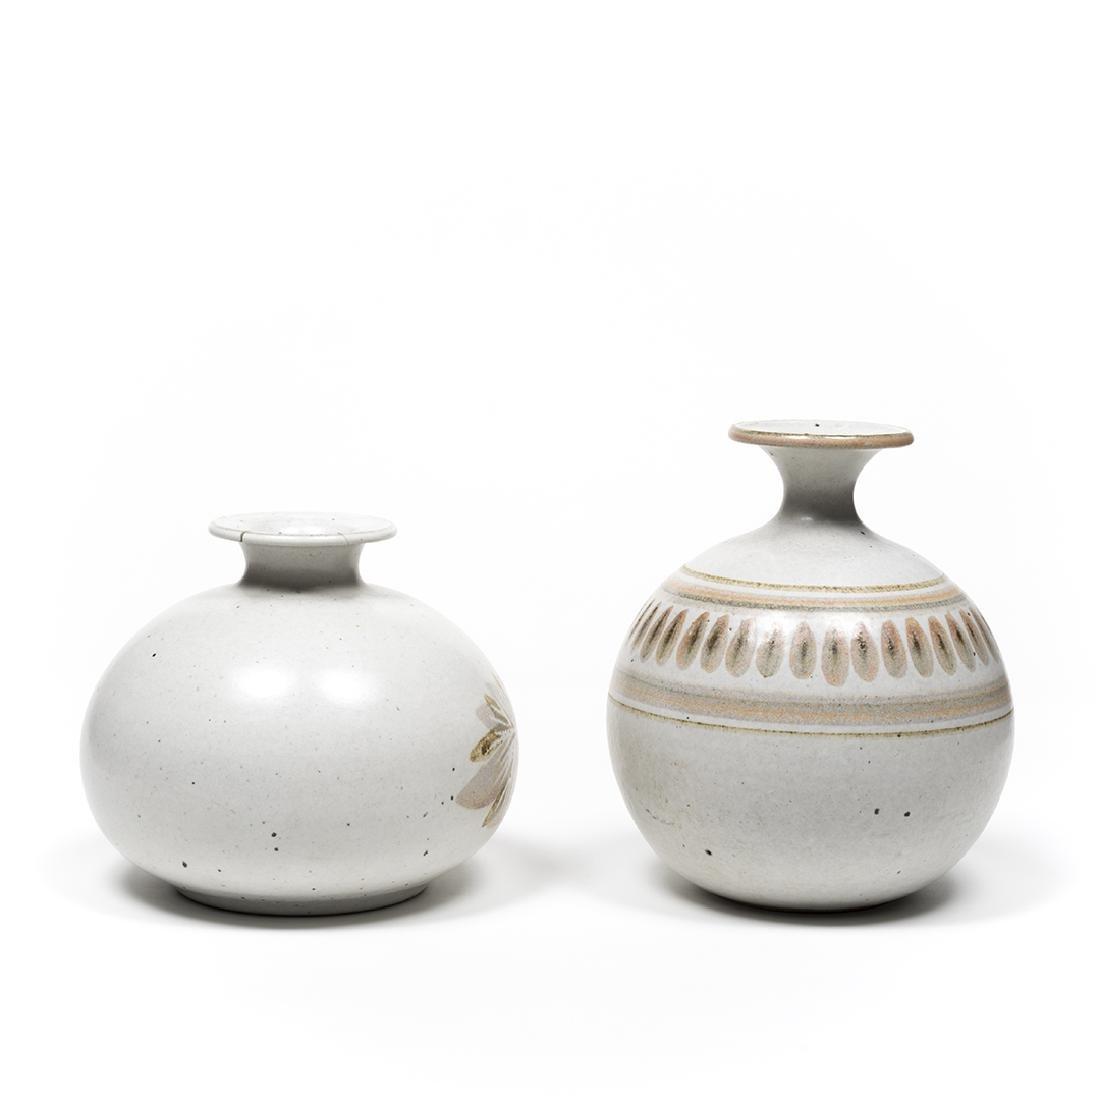 Robert Maxwell Vases (2) - 2